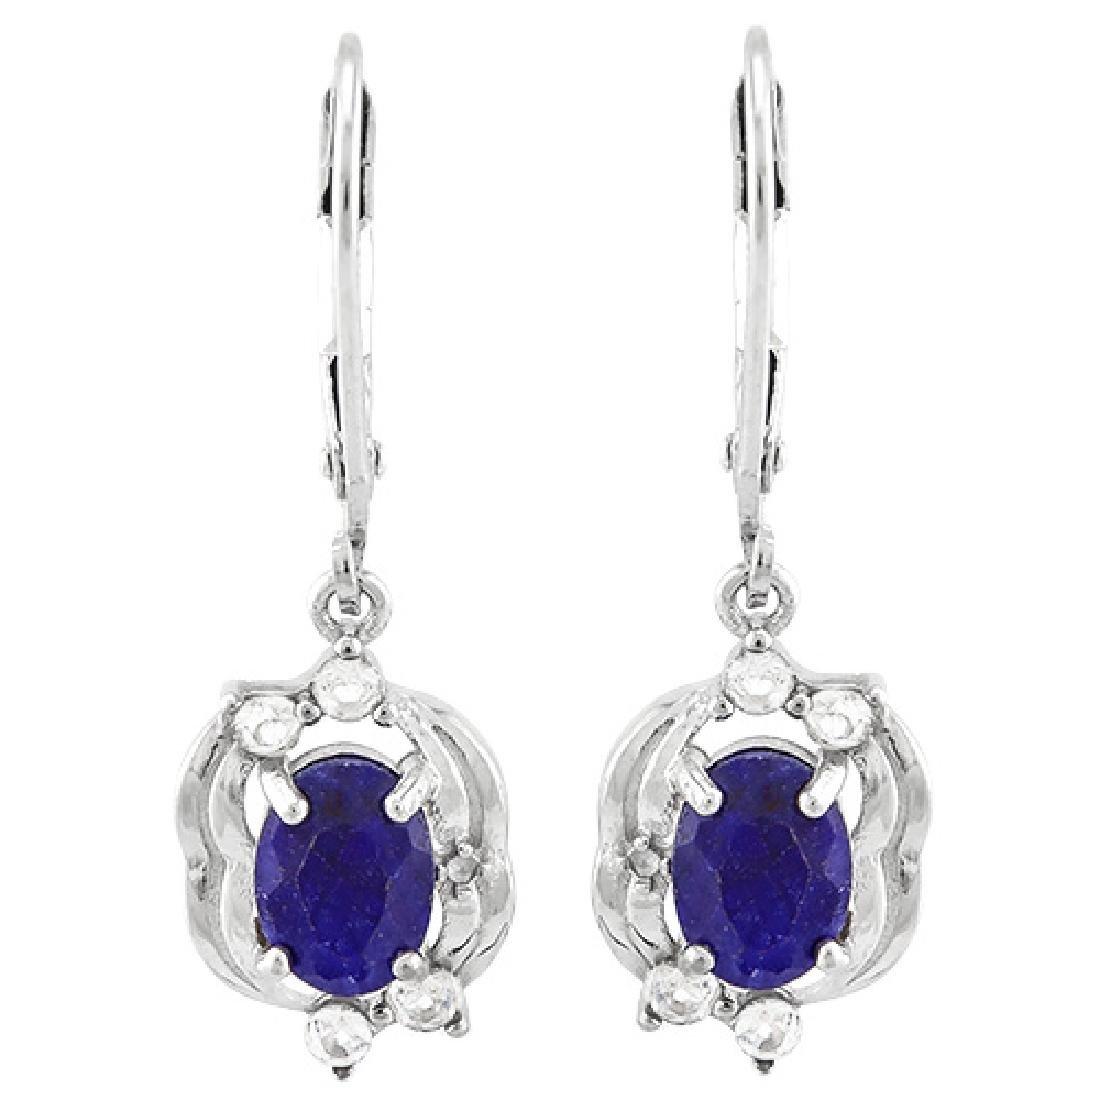 BEAUTIFUL BLUE SAPPHIRE/WHITE TOPAZ STERLING EARGS